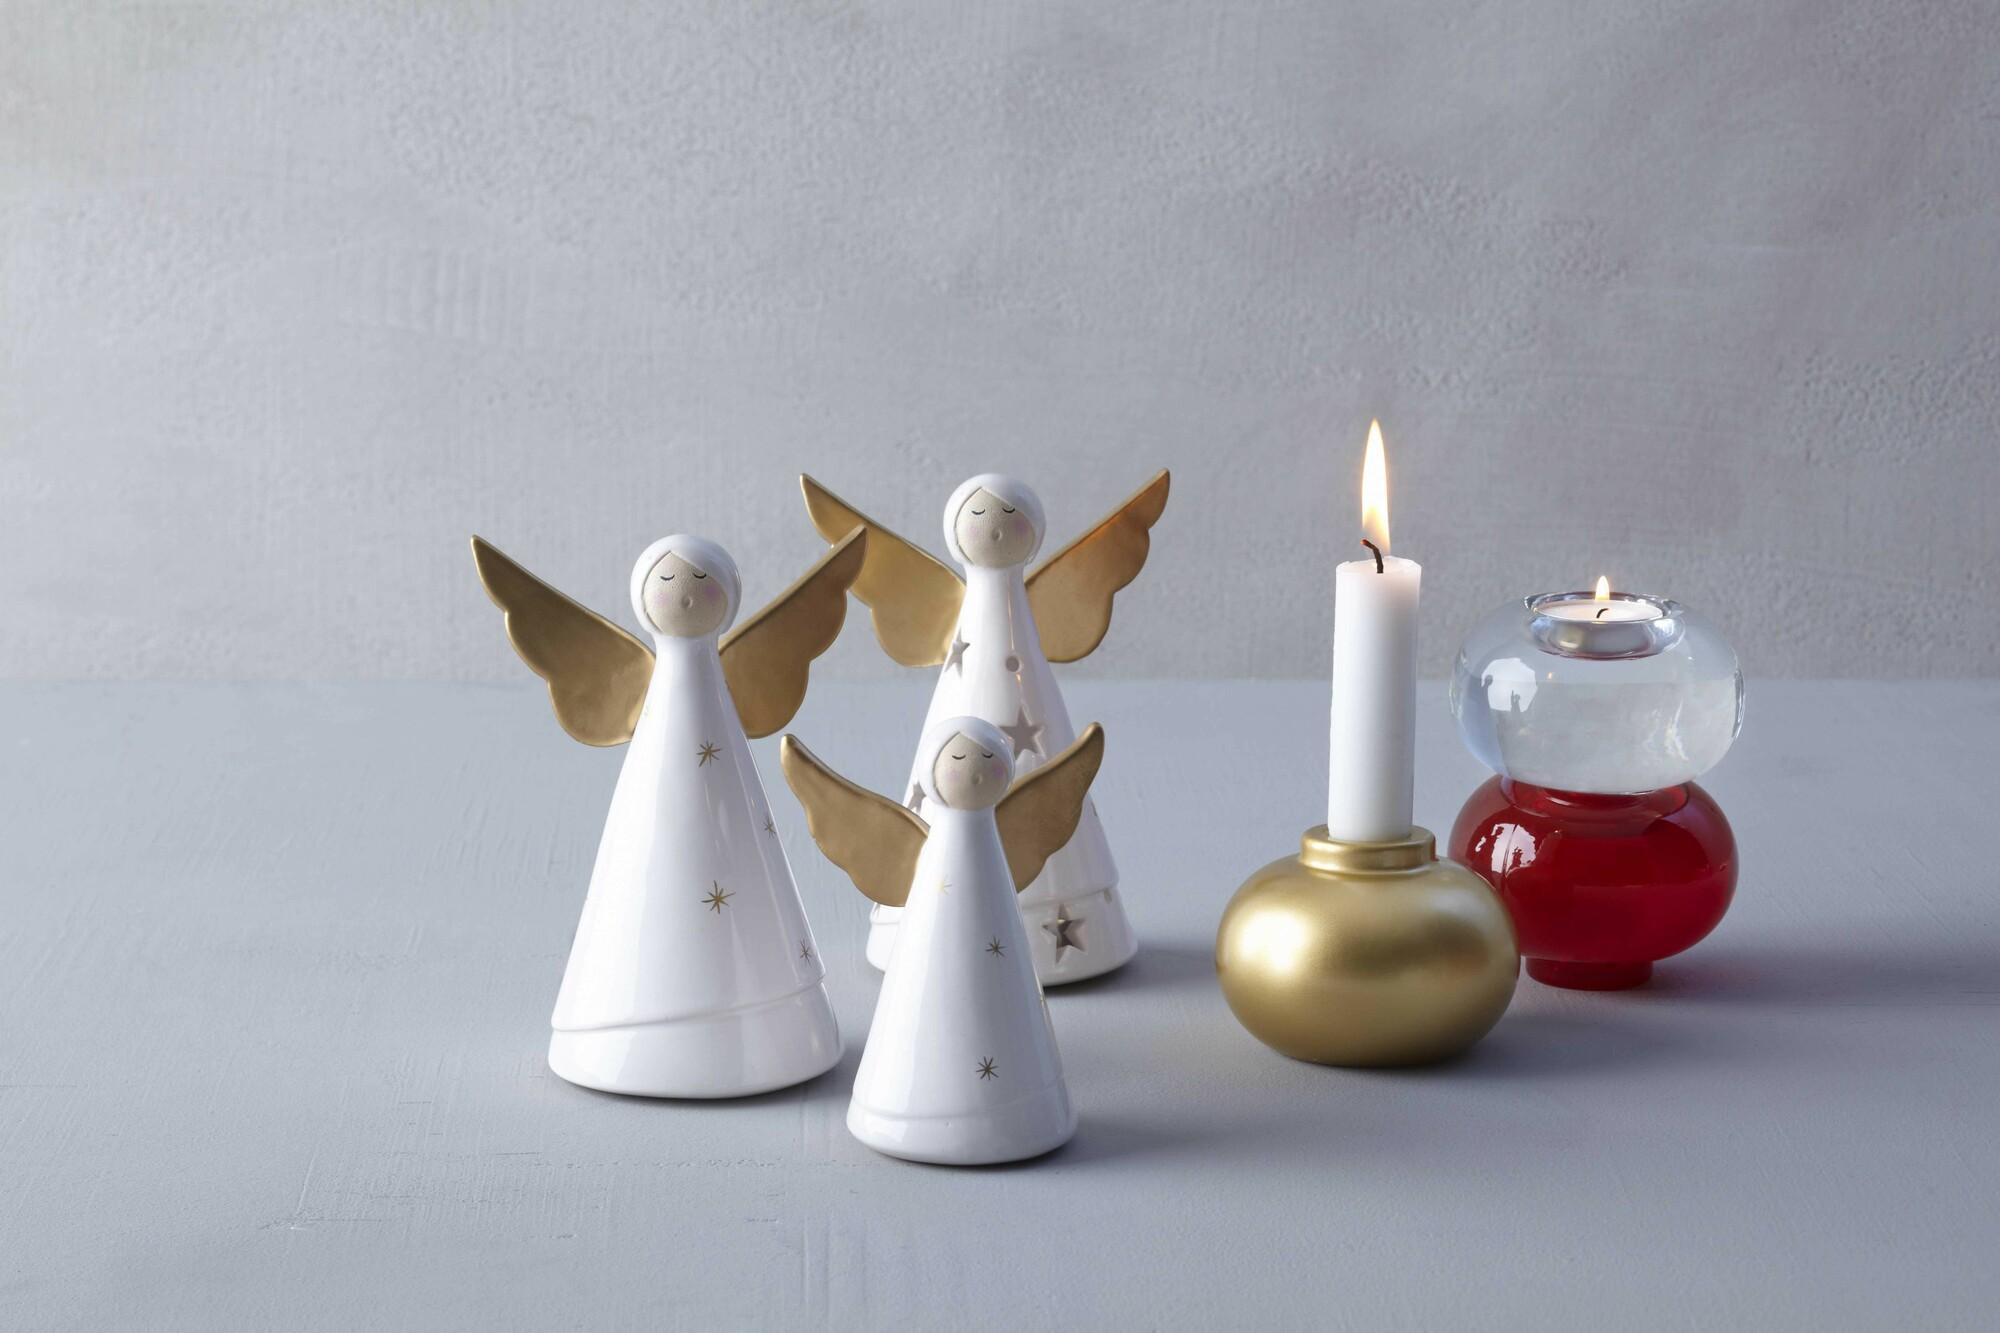 Design Rvs Keukenaccessoires : Leonardo engel Natale wit/goud, leuke ...